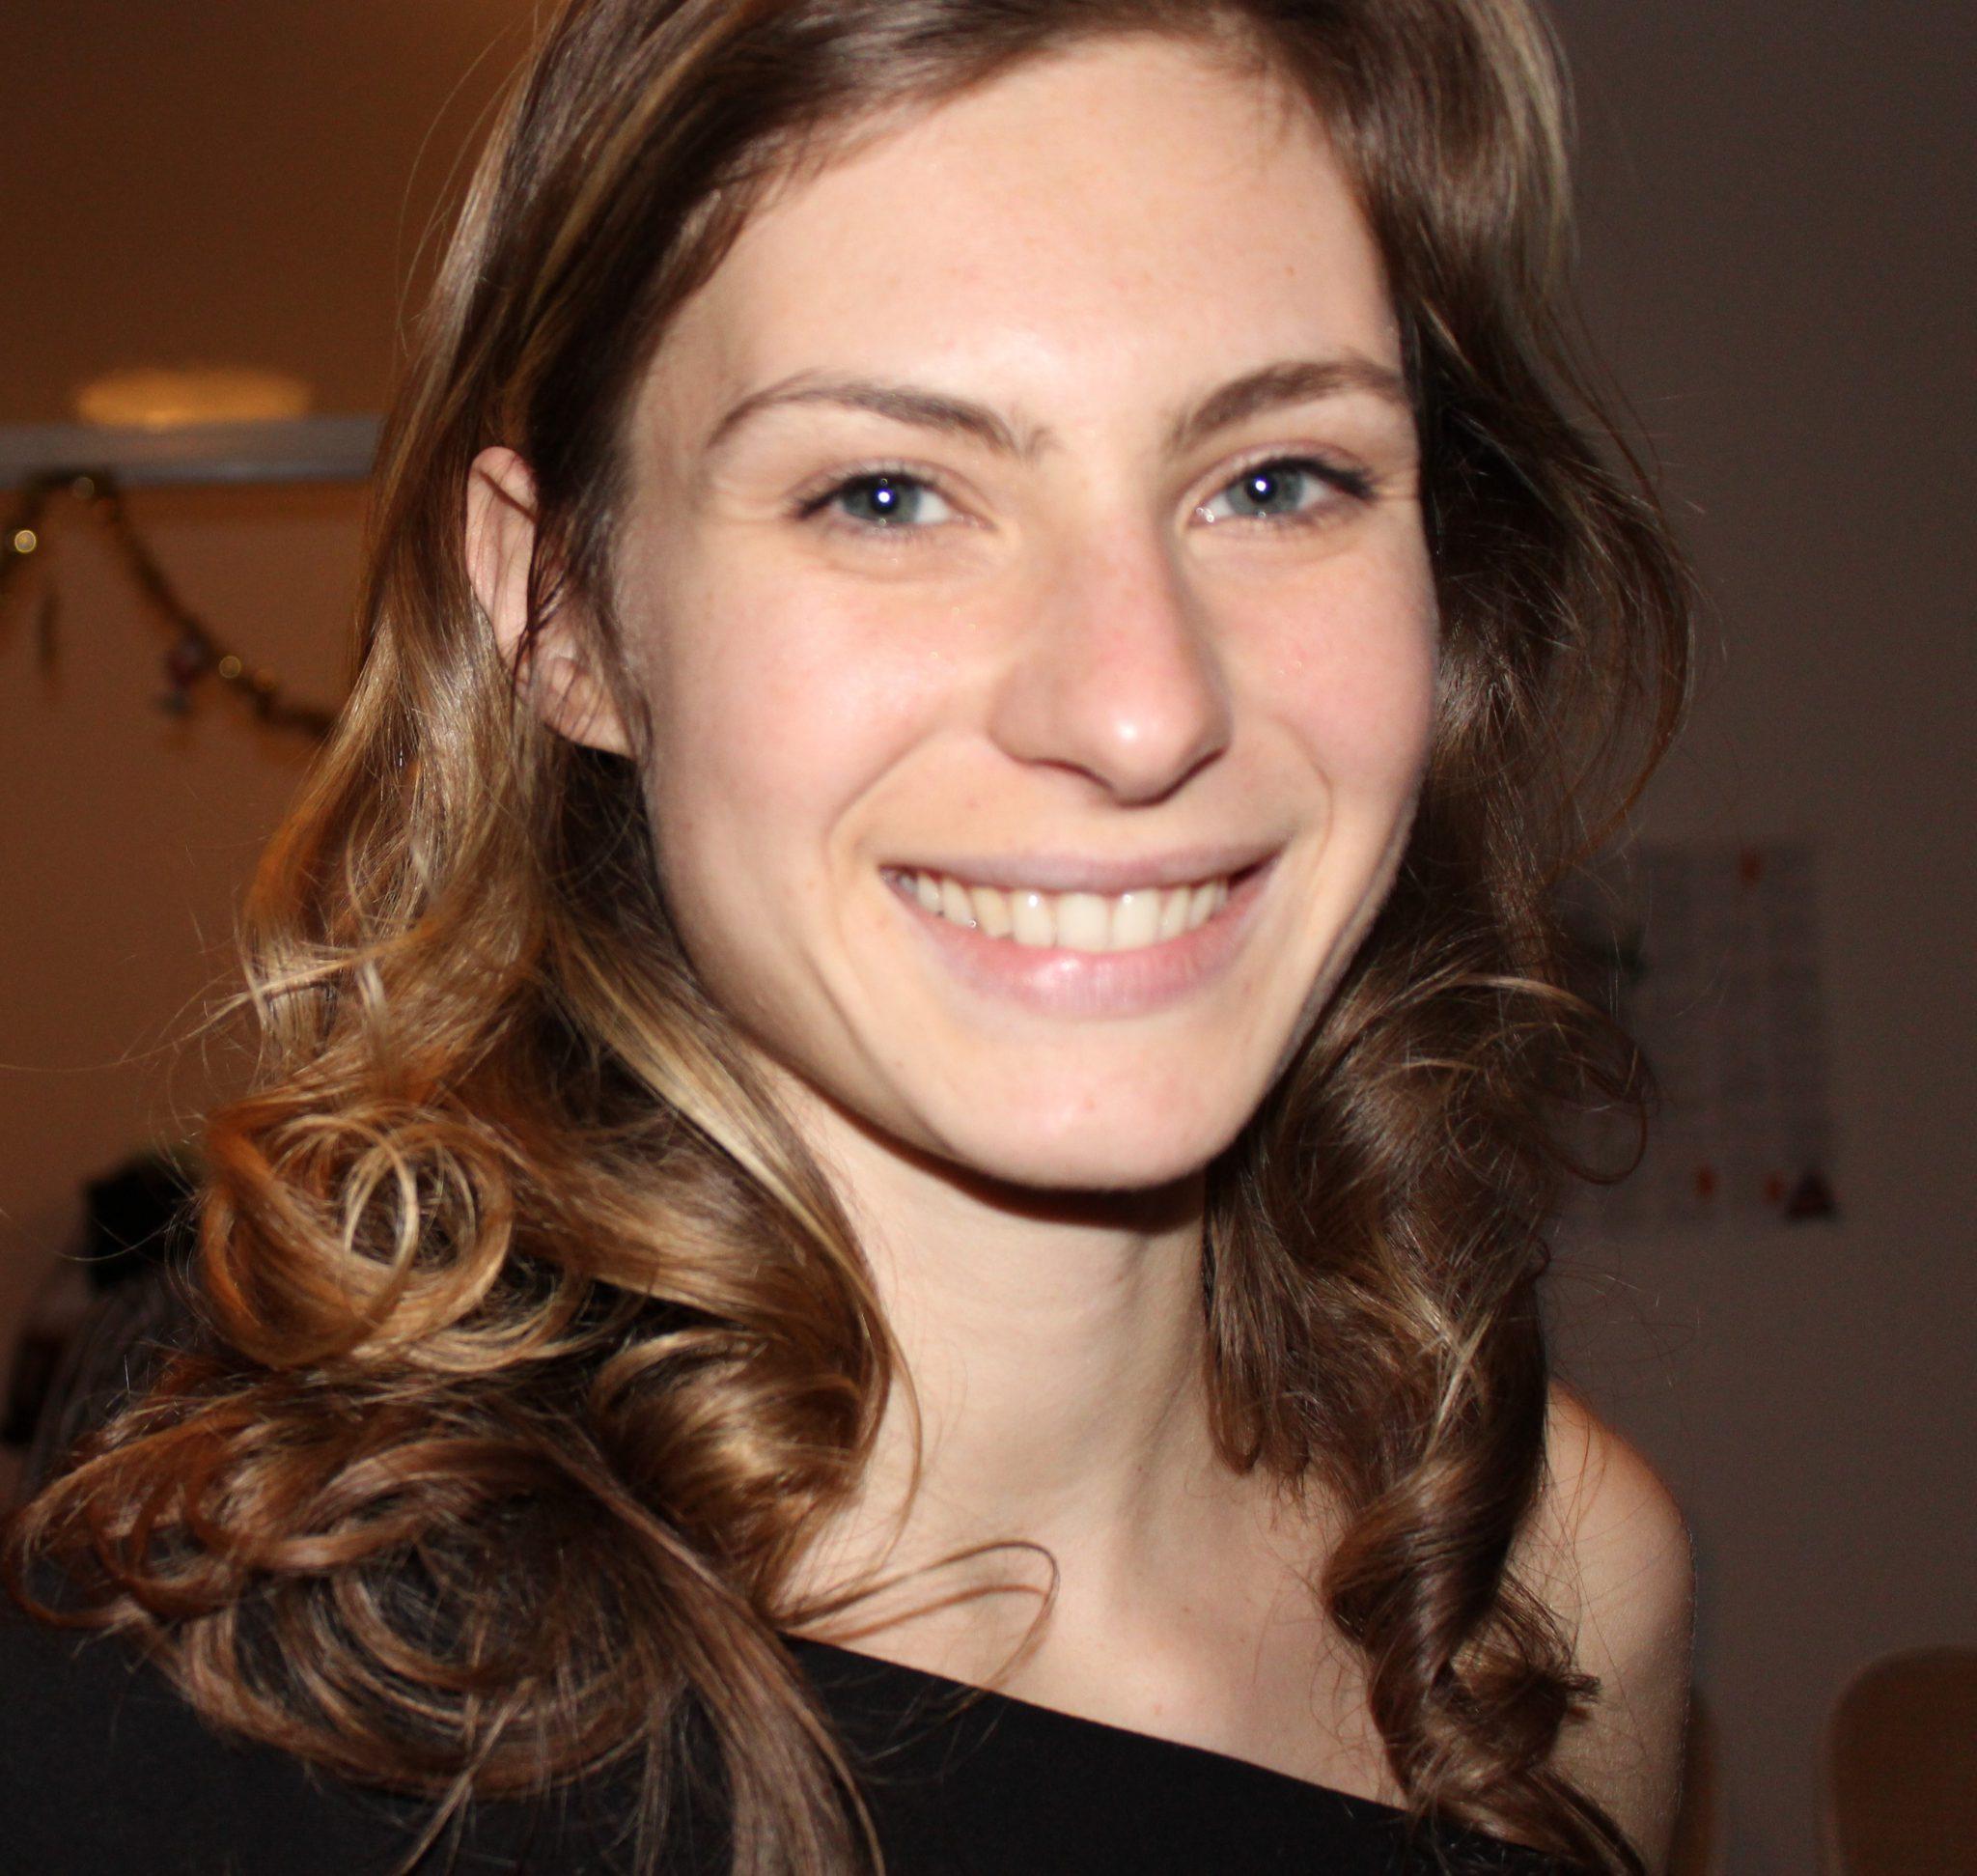 Sofia Fiammenghi